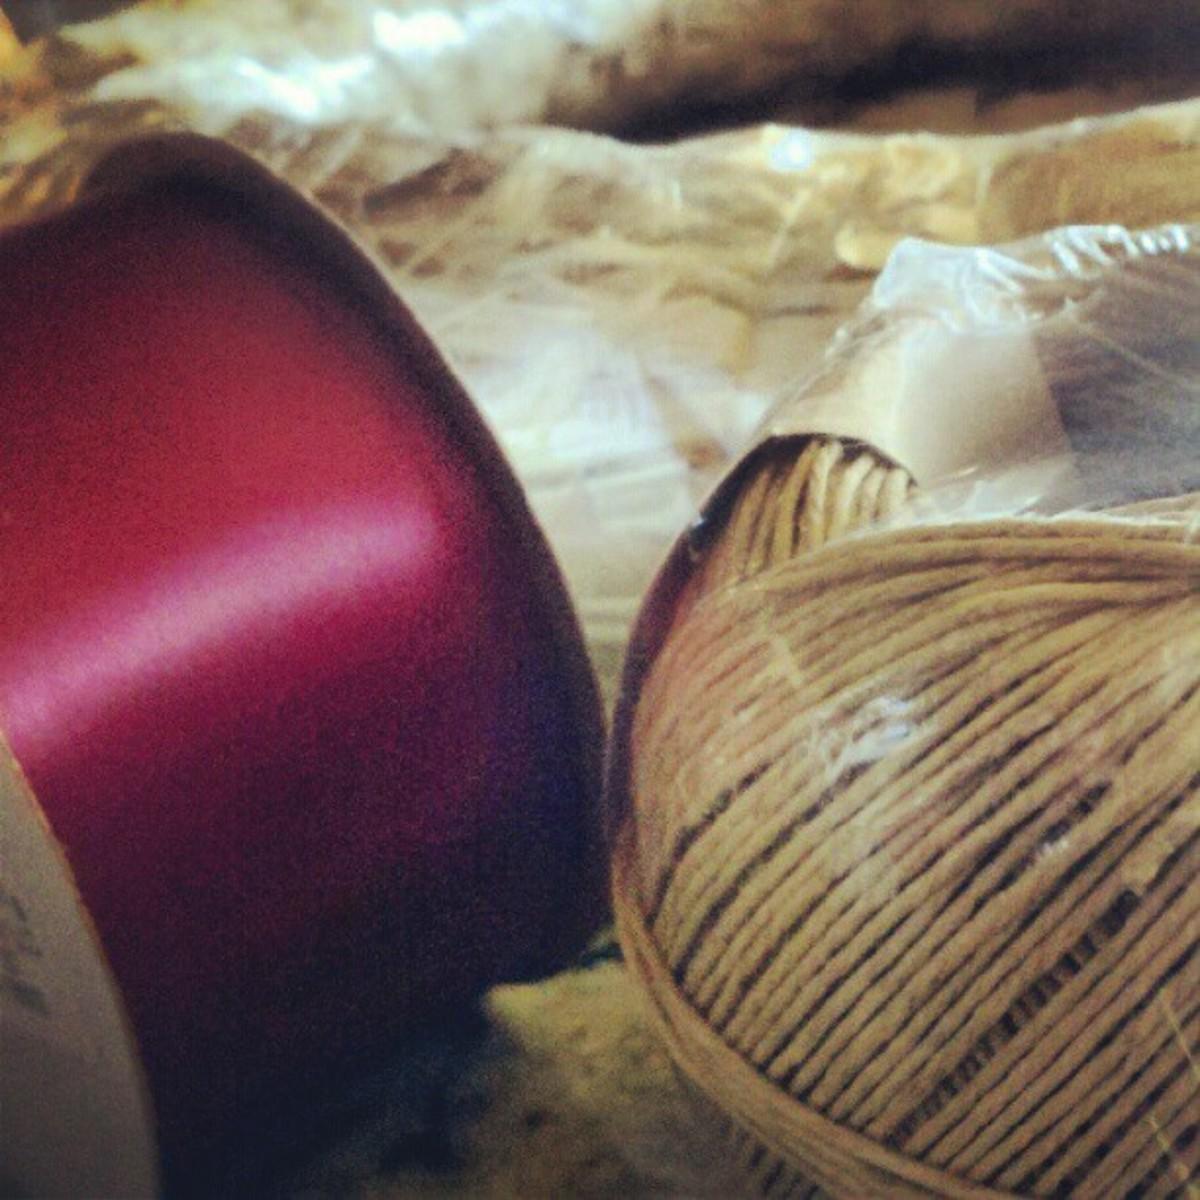 Supplies for cork wreath